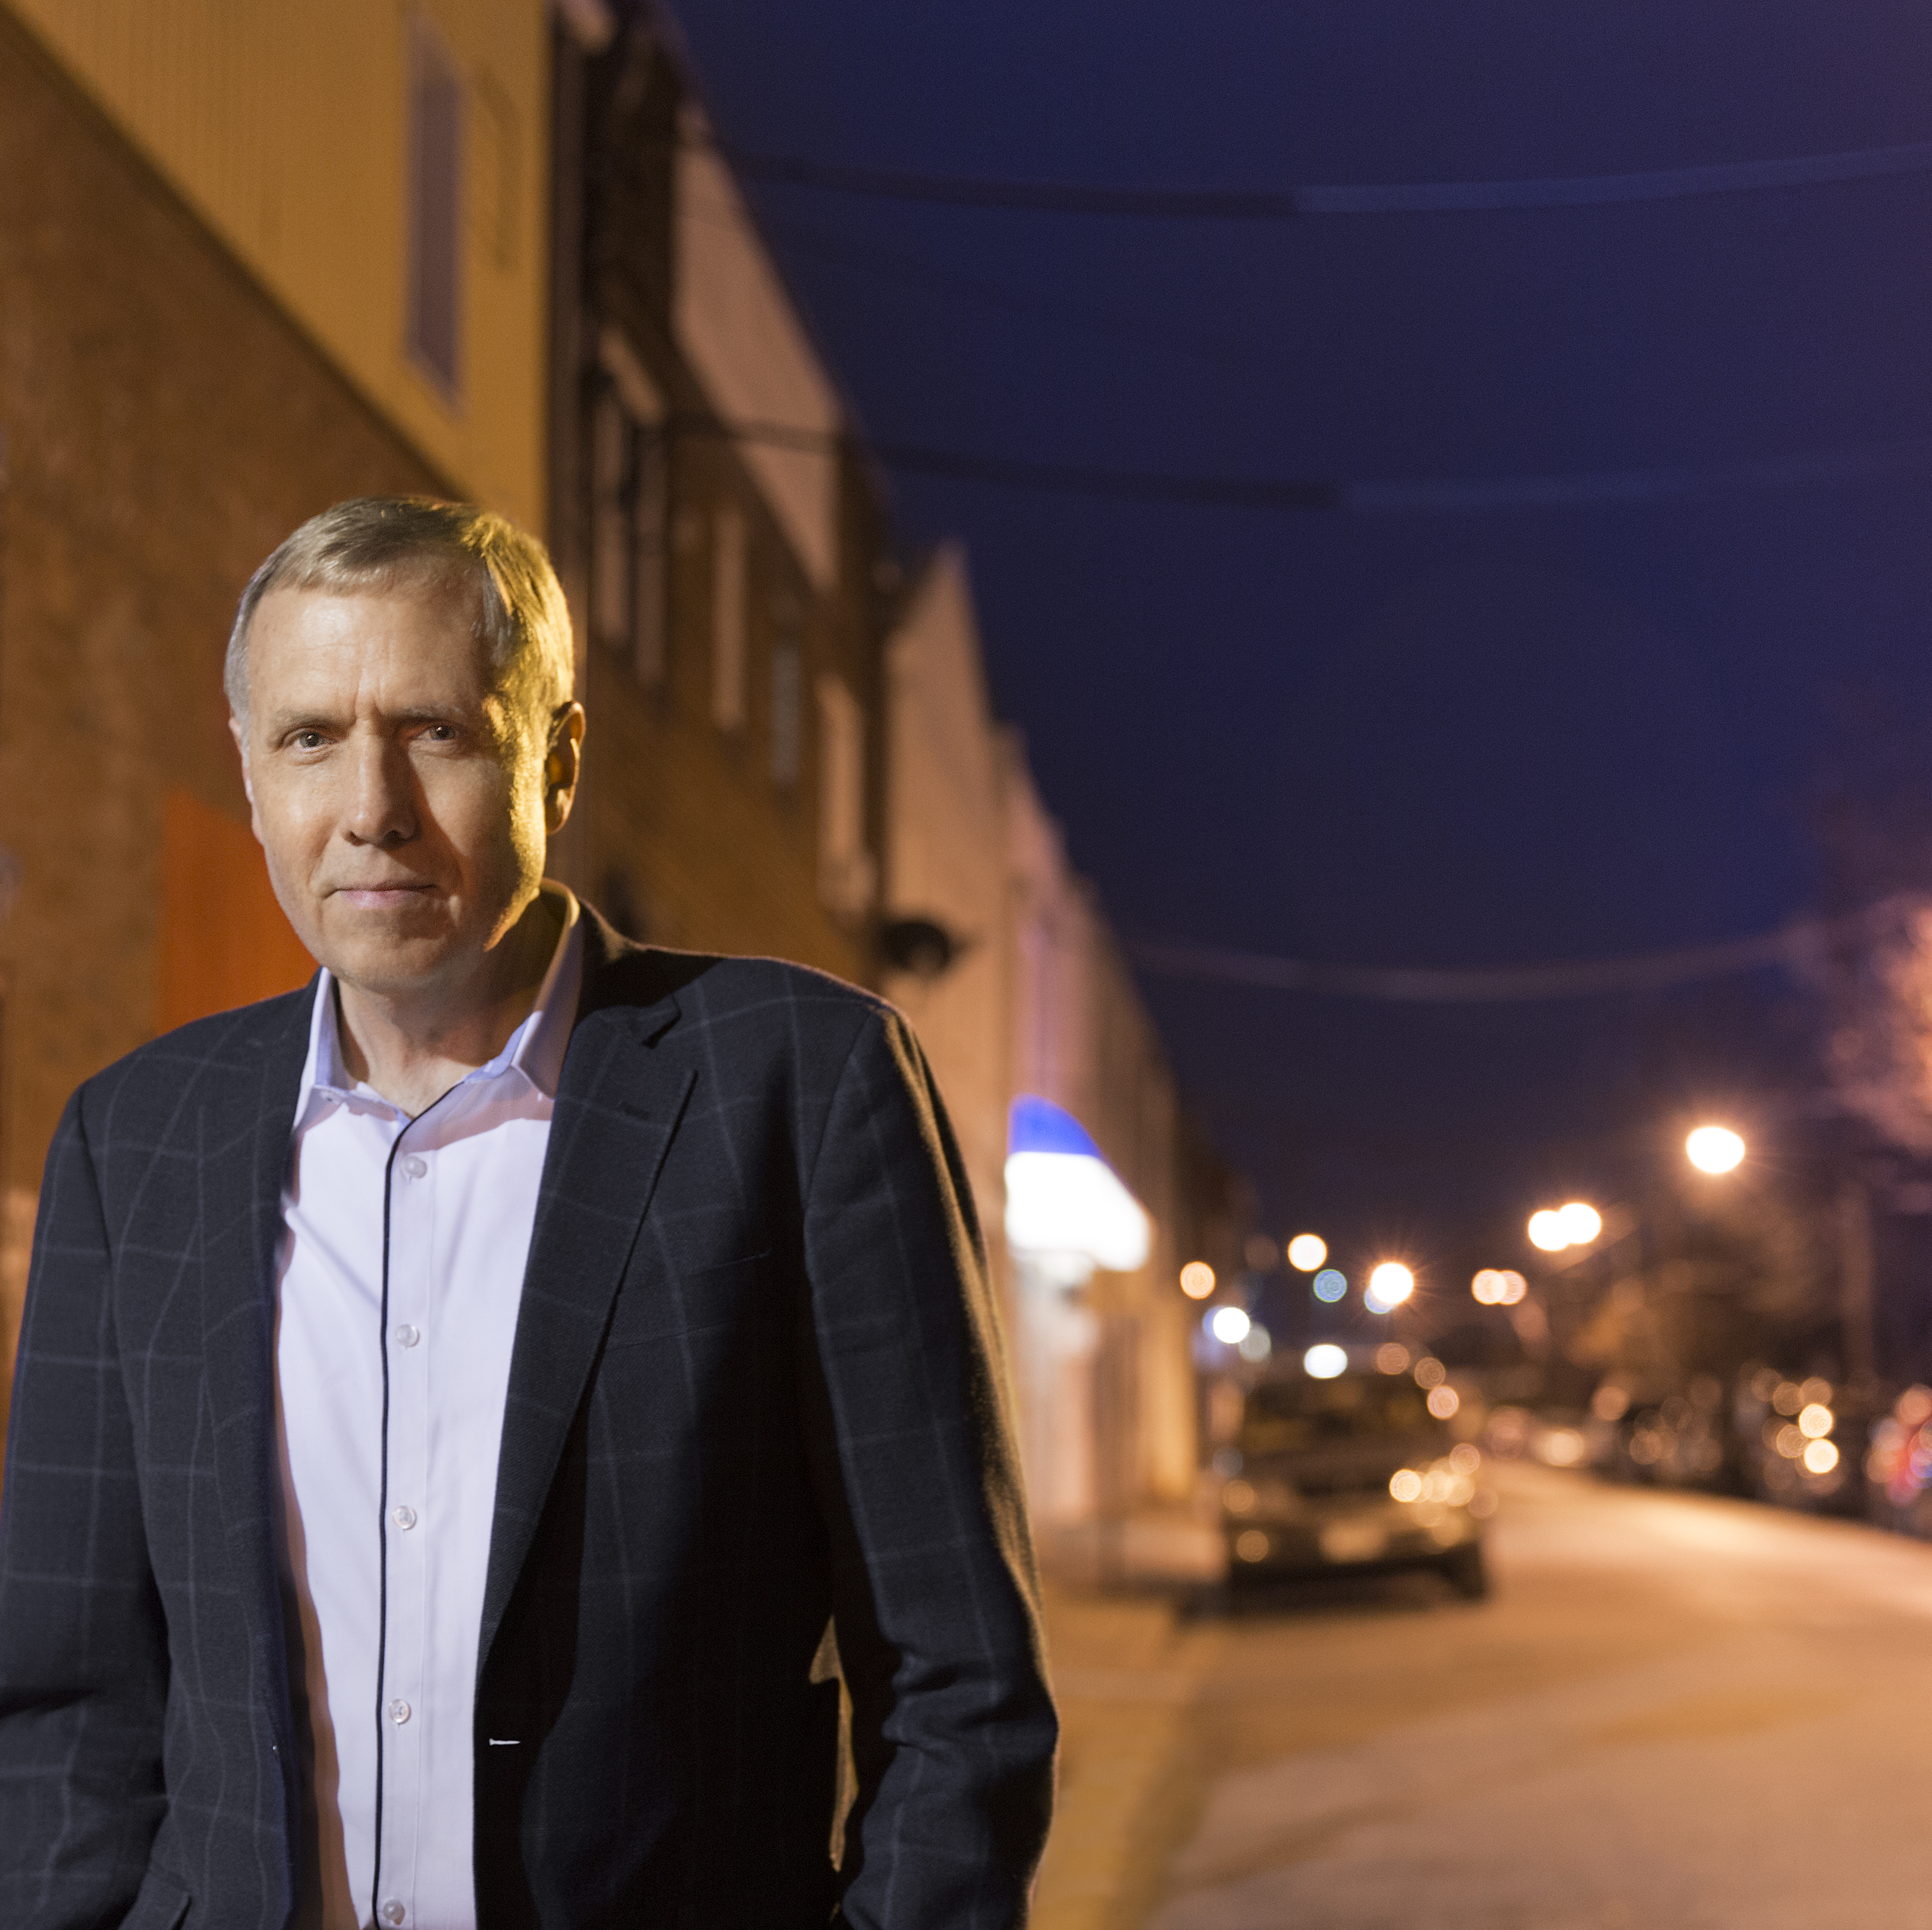 Chuck Redd (photo by Robert Severi)